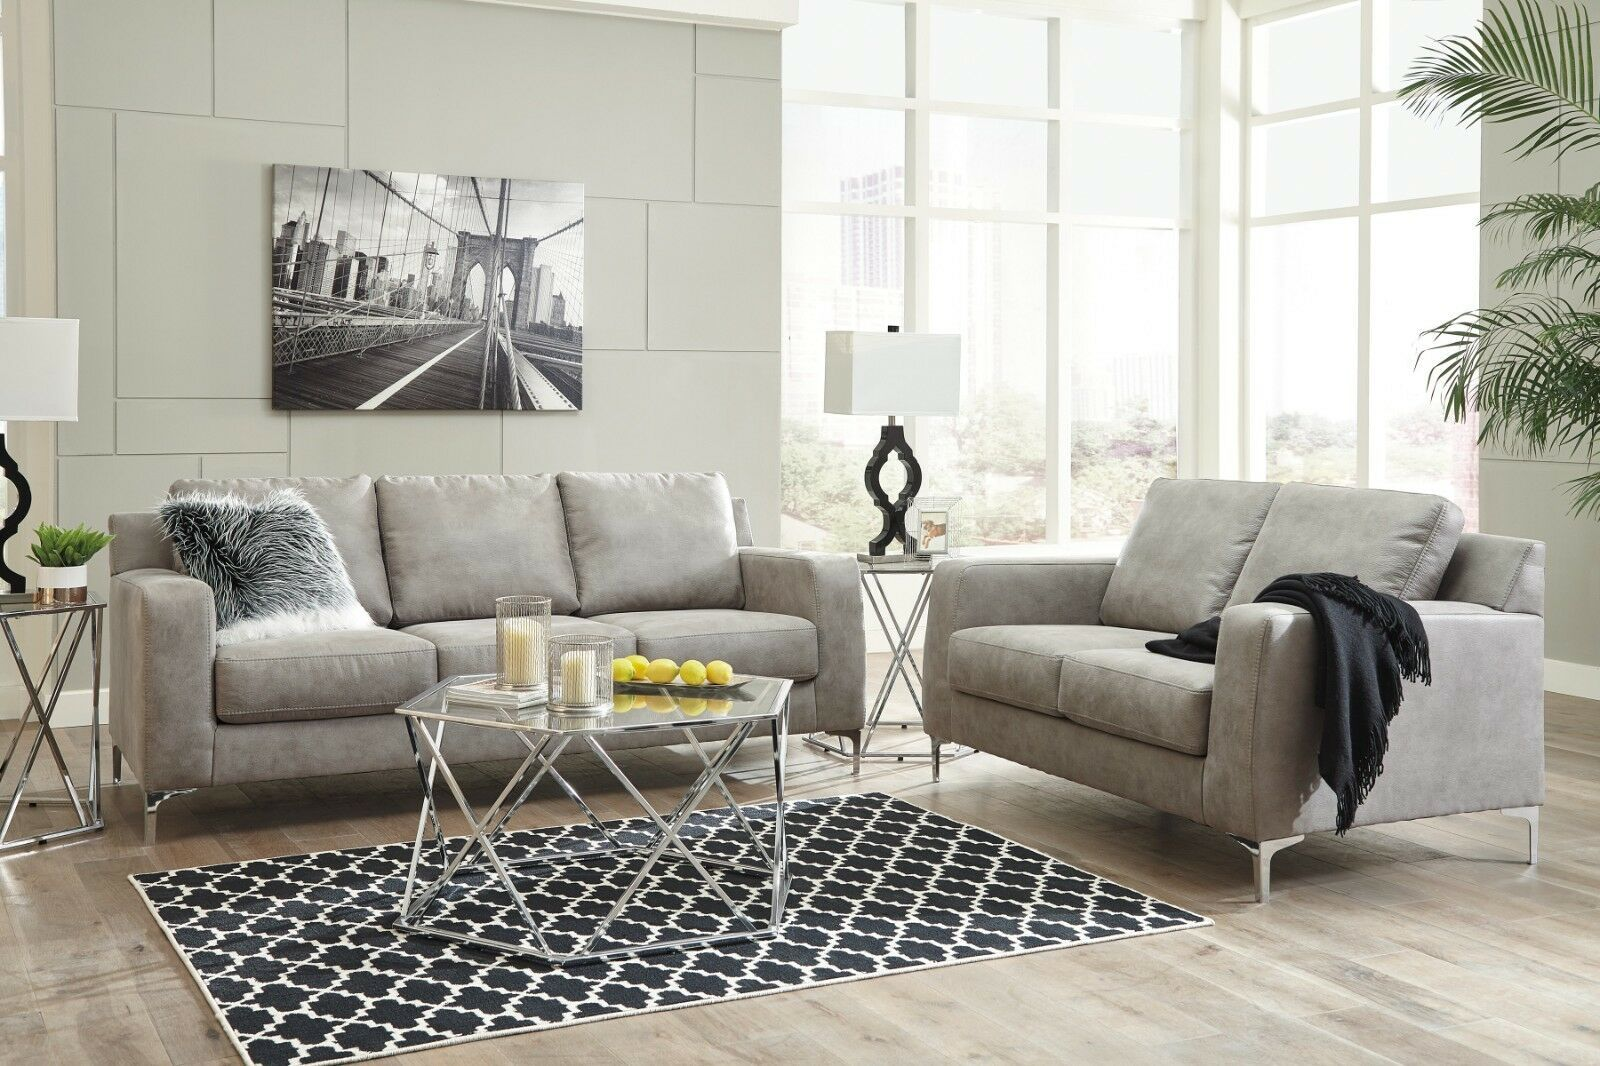 Ashley Furniture Ryler Steel Sofa And Loveseat Living Room Set